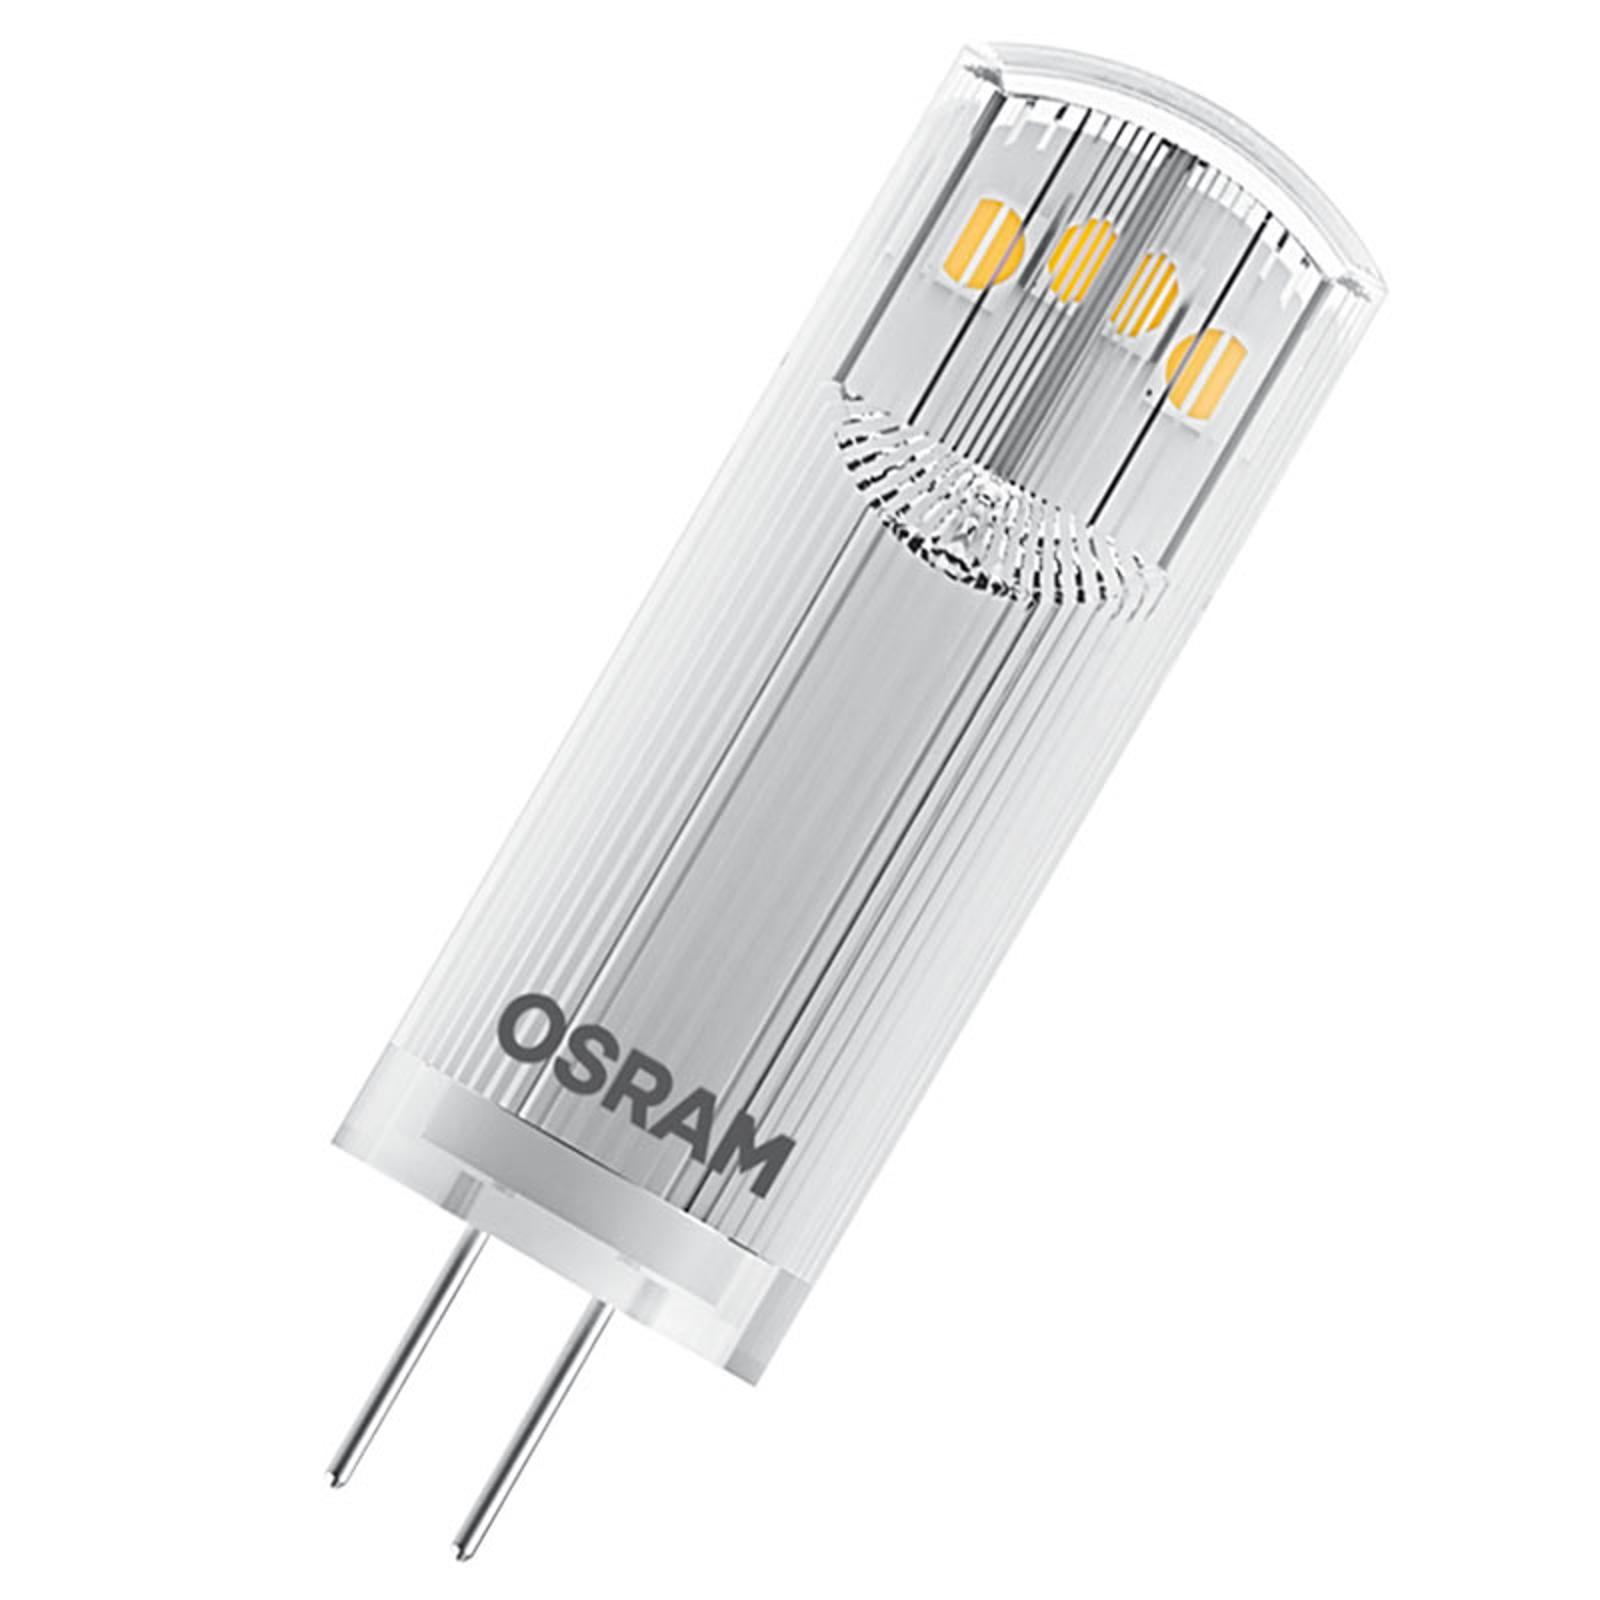 OSRAM-LED-lamppu G4 Star Pin 1,8W matta 4 000 K